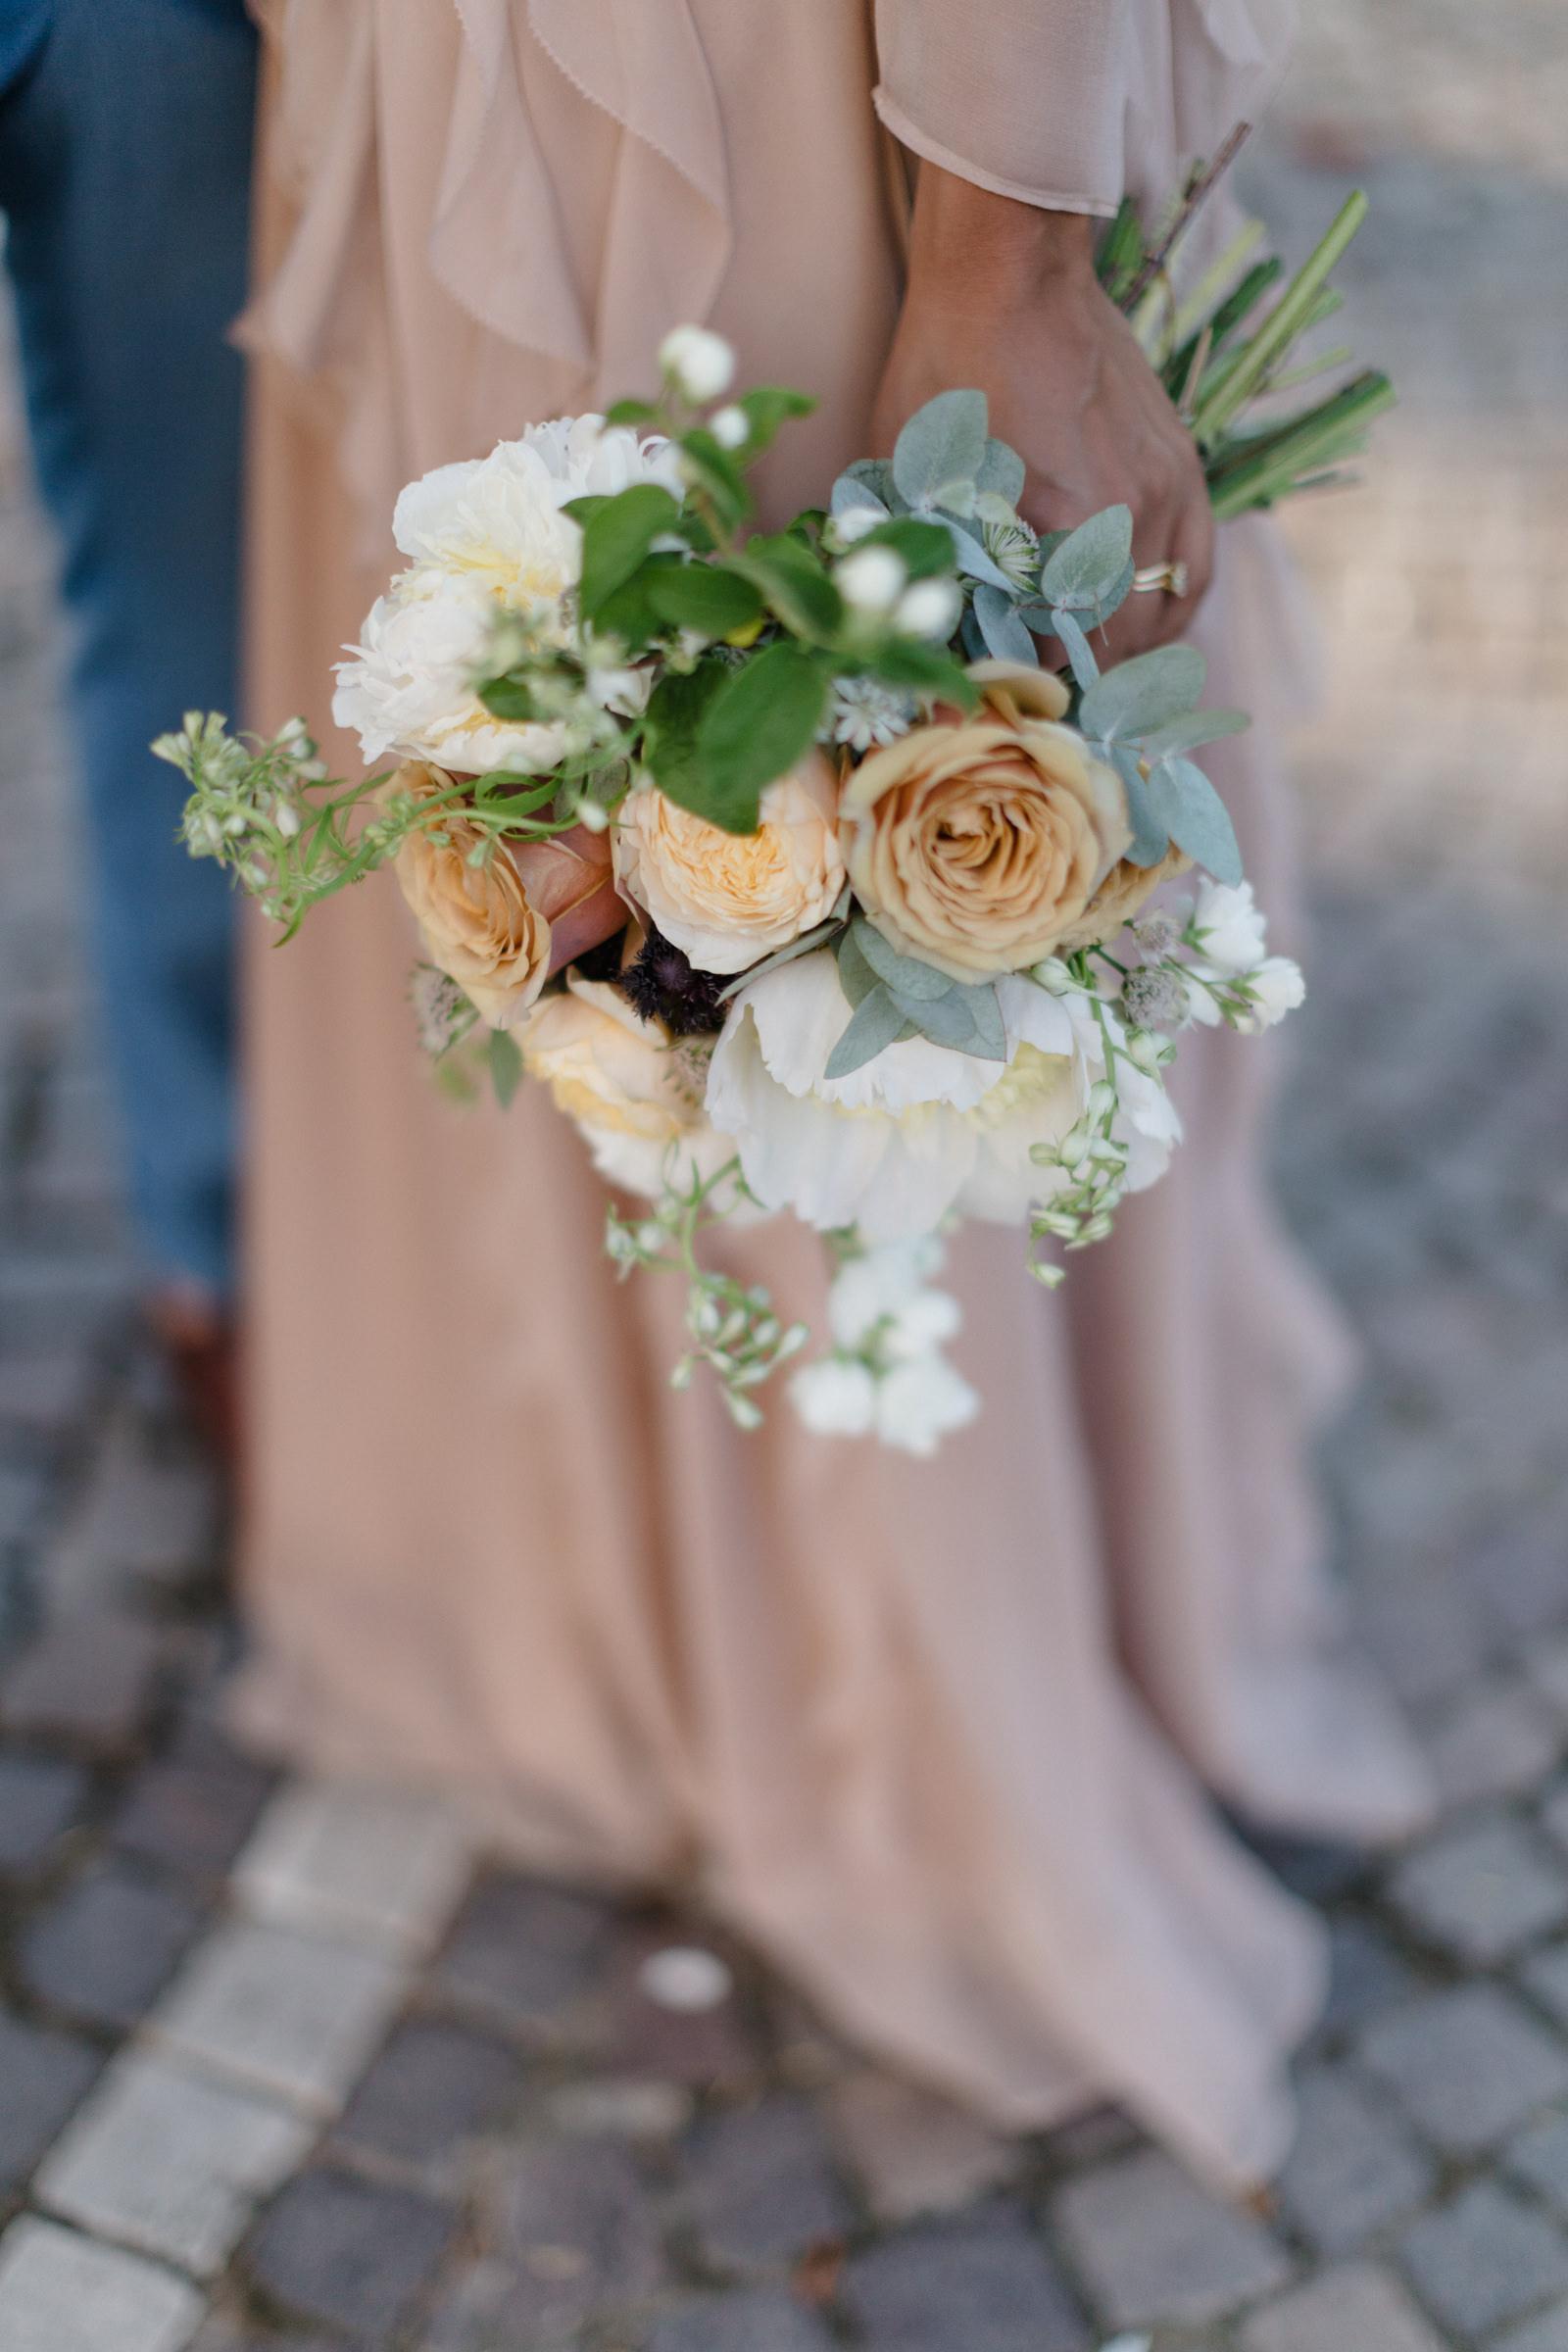 villa-cora-wedding-photographer-florence-062